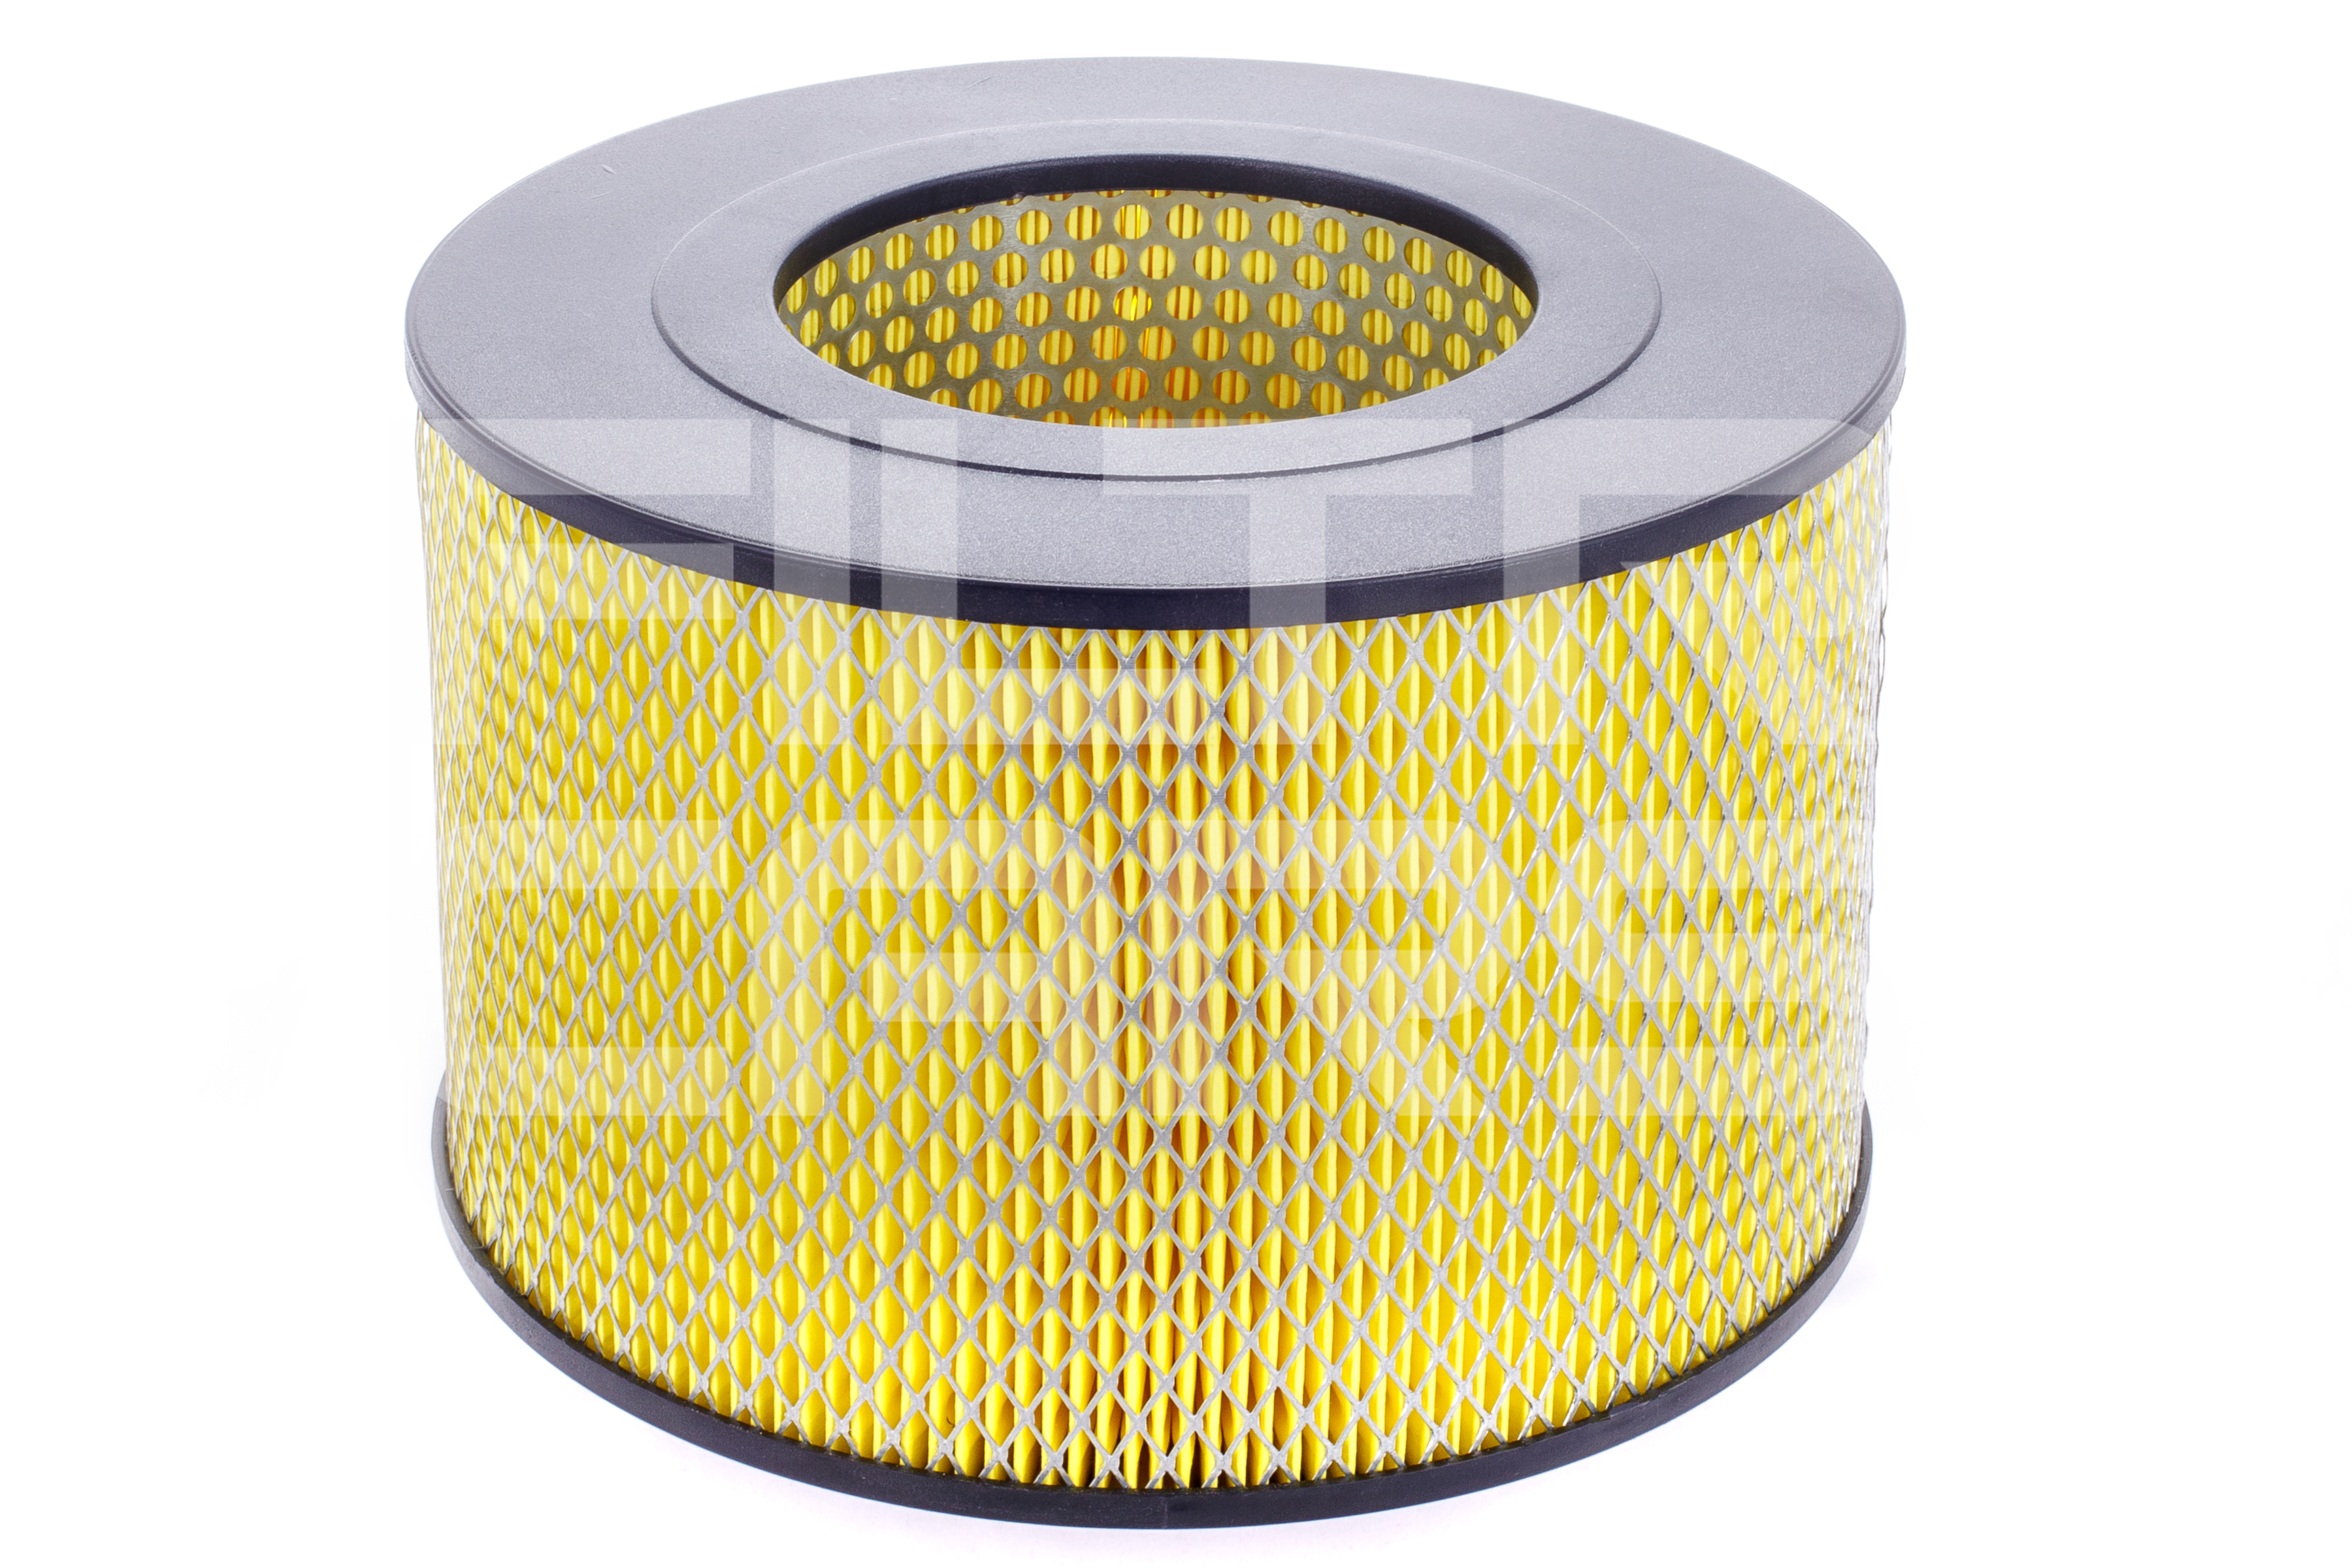 filtr-cars-filtr-powietrza-samochodwoe